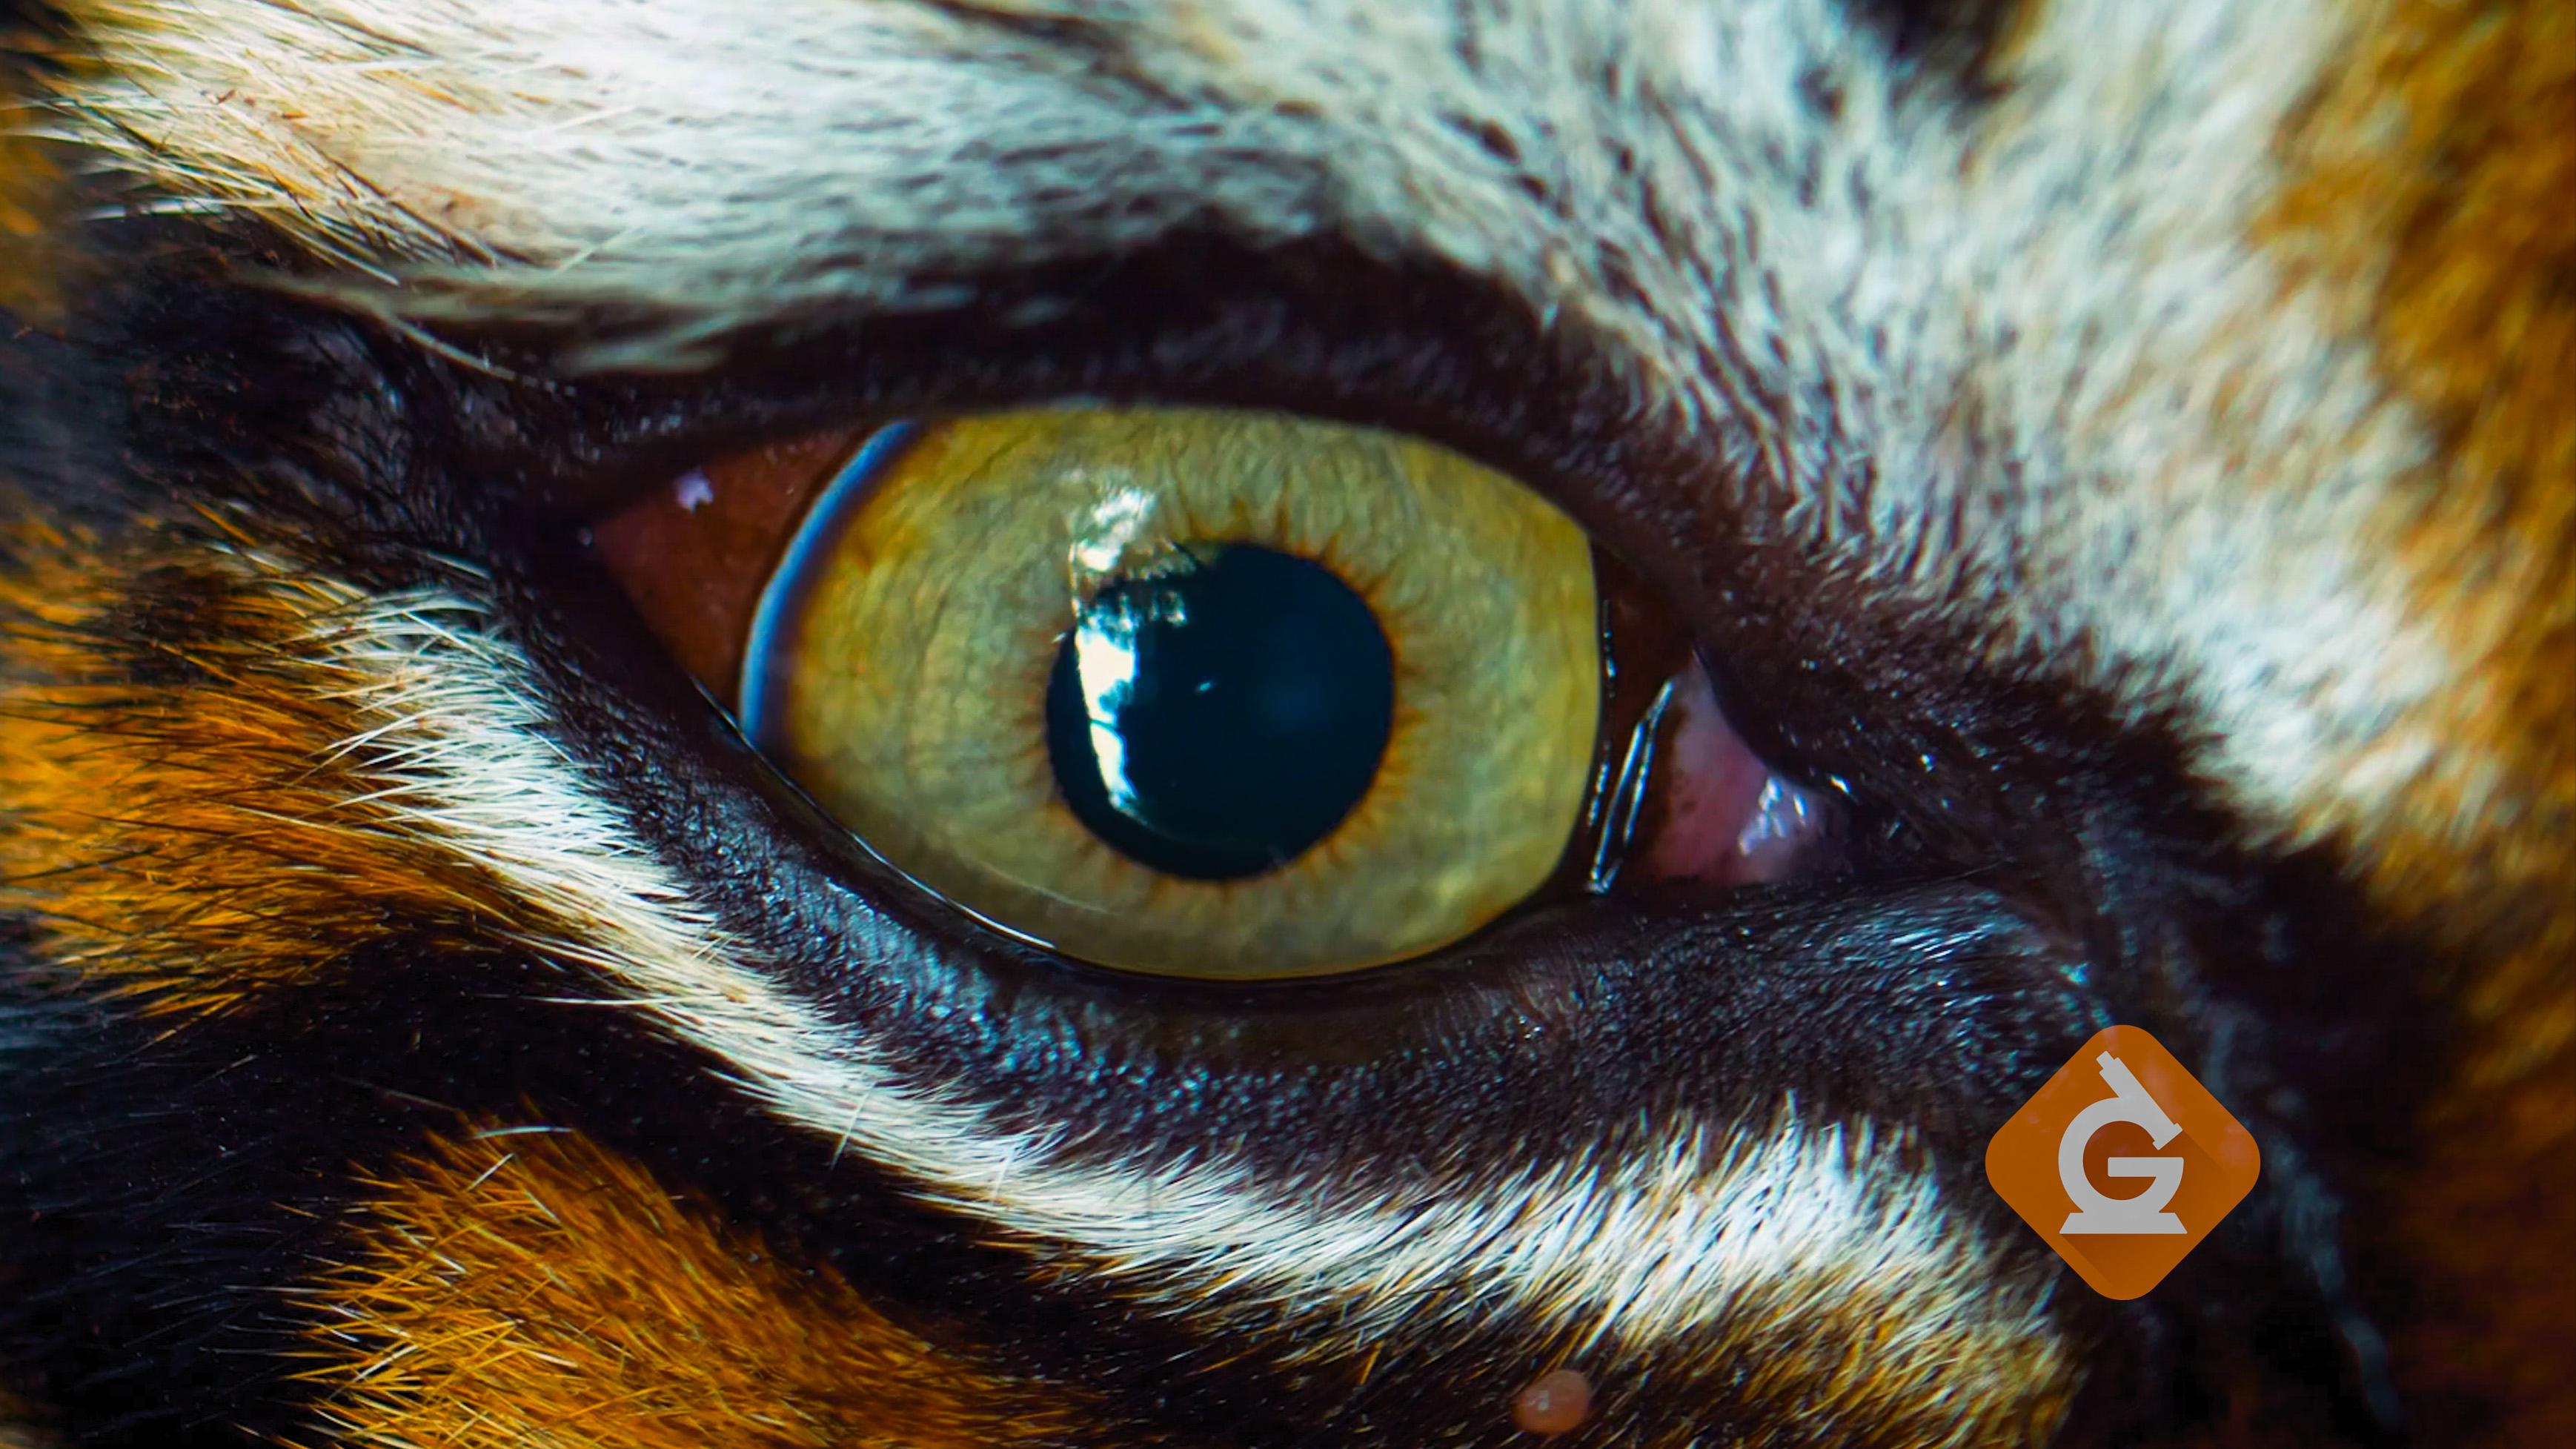 closeup of a tiger's eyes